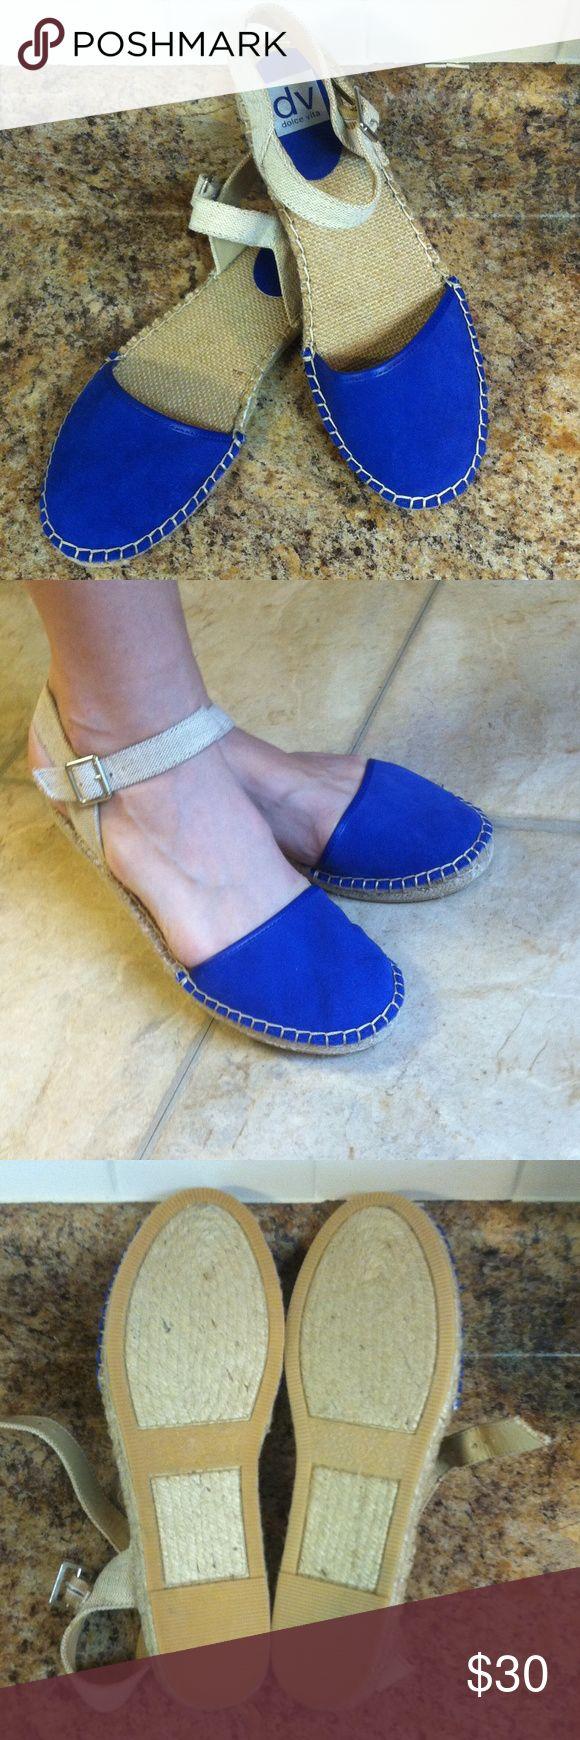 Best 25 Closed Toe Sandals Ideas On Pinterest Cute